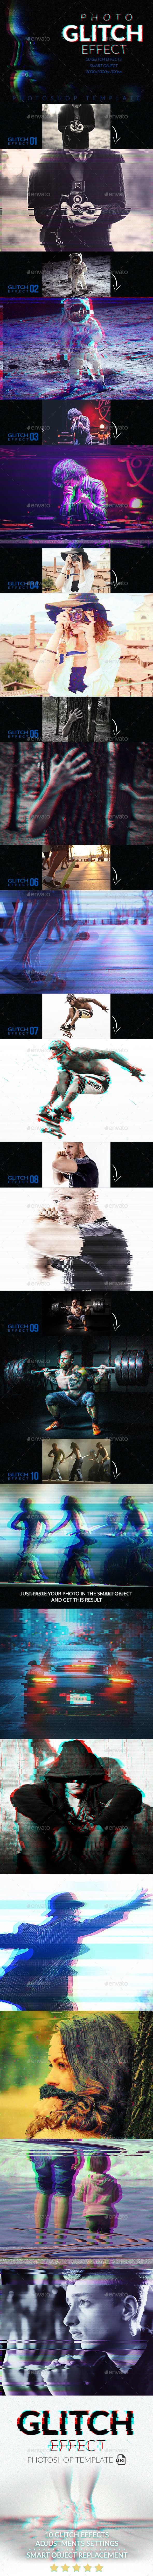 Glitch Effect Creator - Photo Templates Graphics